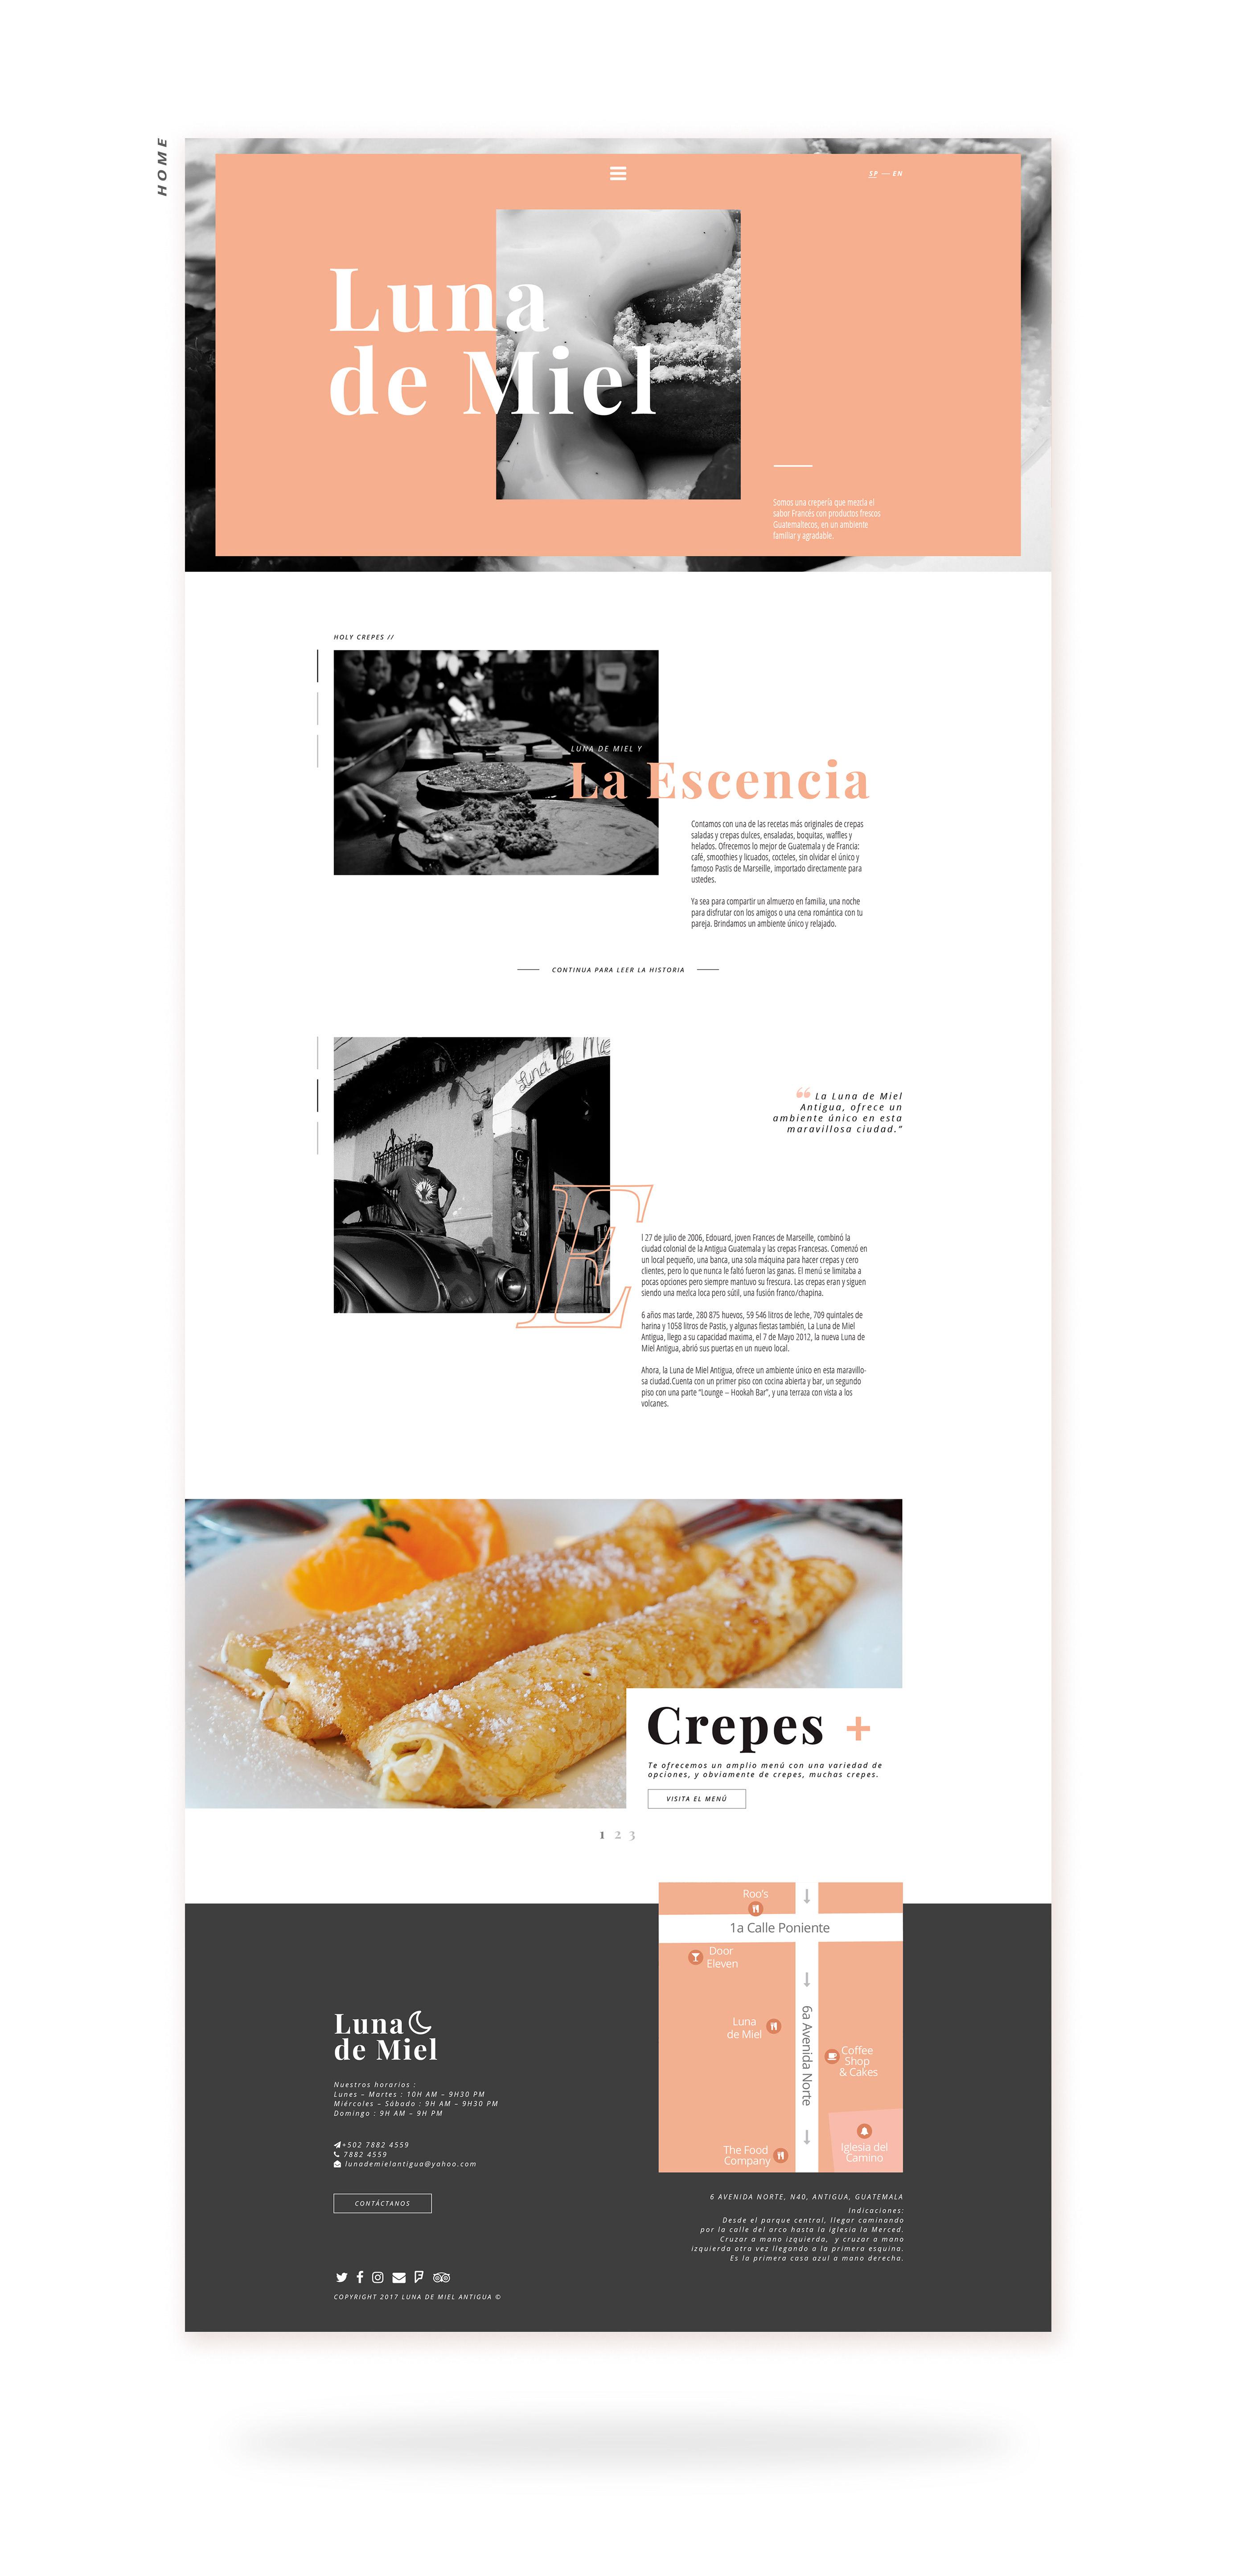 Luna De Miel Website Design On Behance